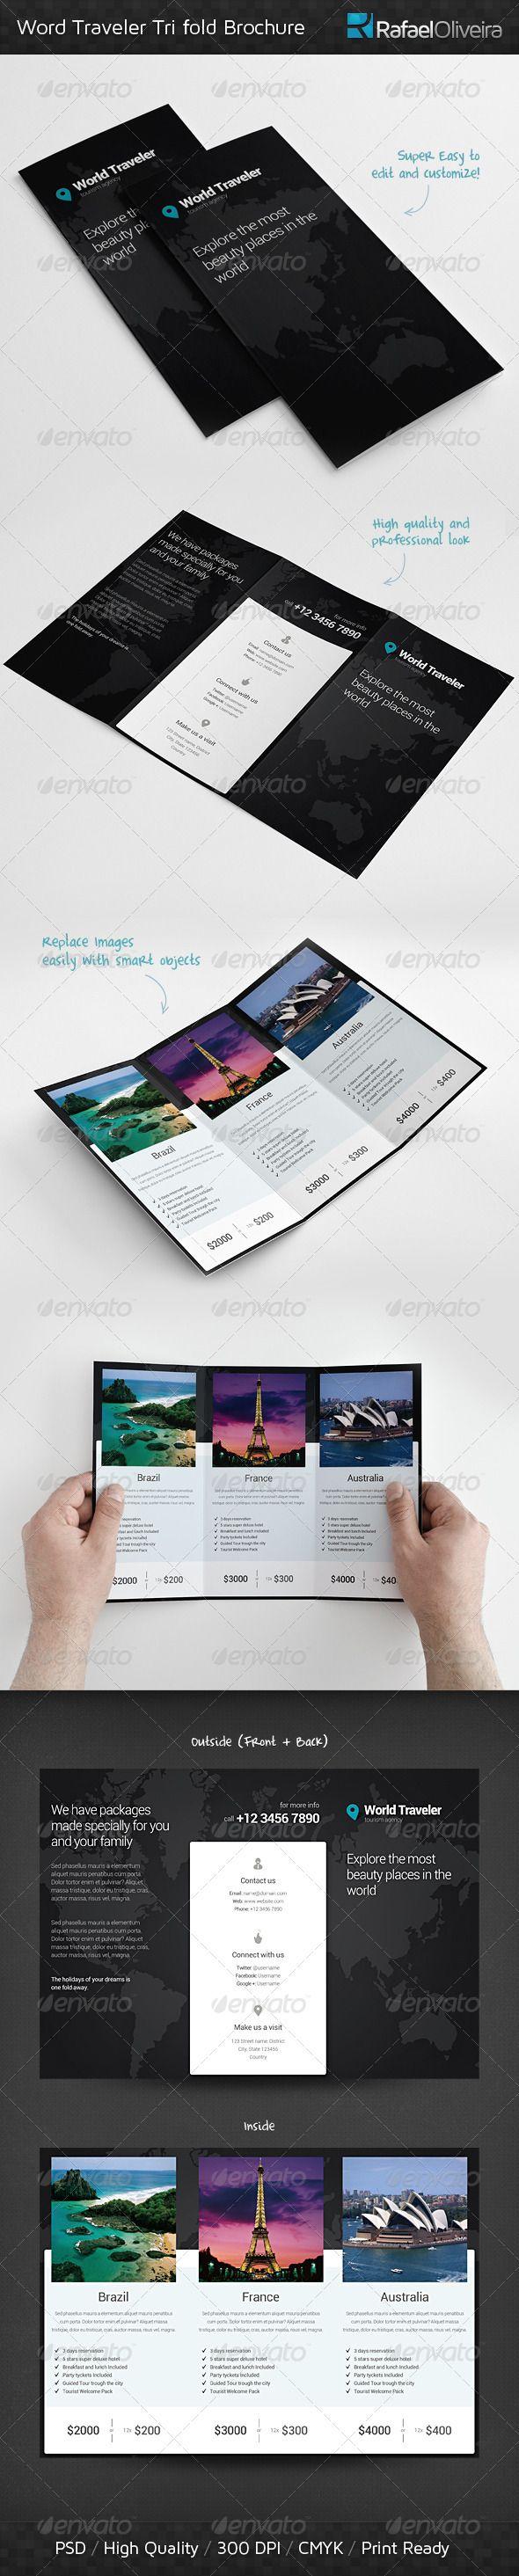 World Traveler Tri Fold Brochure - Corporate Brochures | Brochure Inspiration